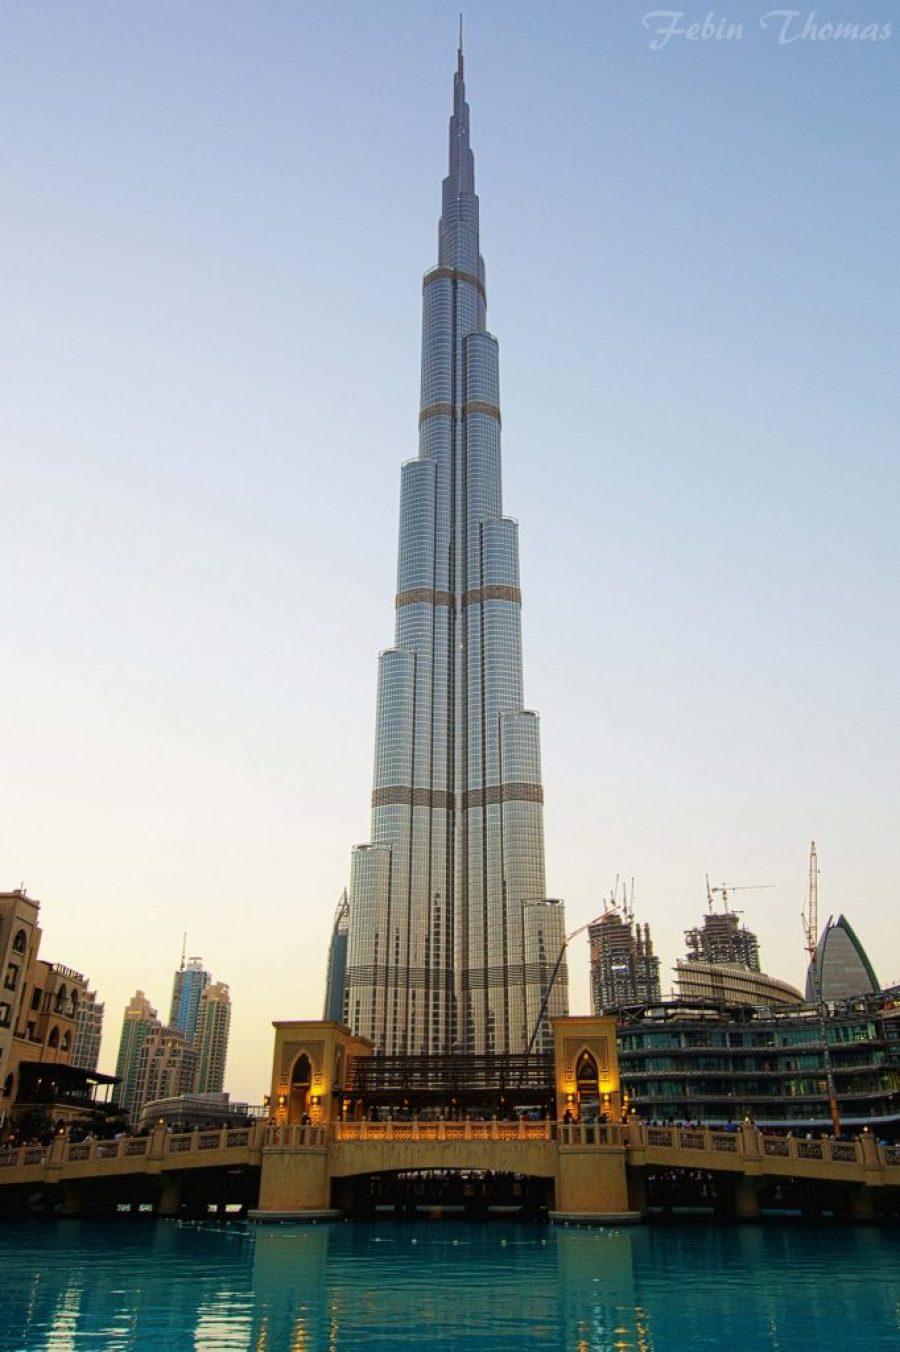 Burj Khalifa Dubai Architecture Guide United Arab Emirates